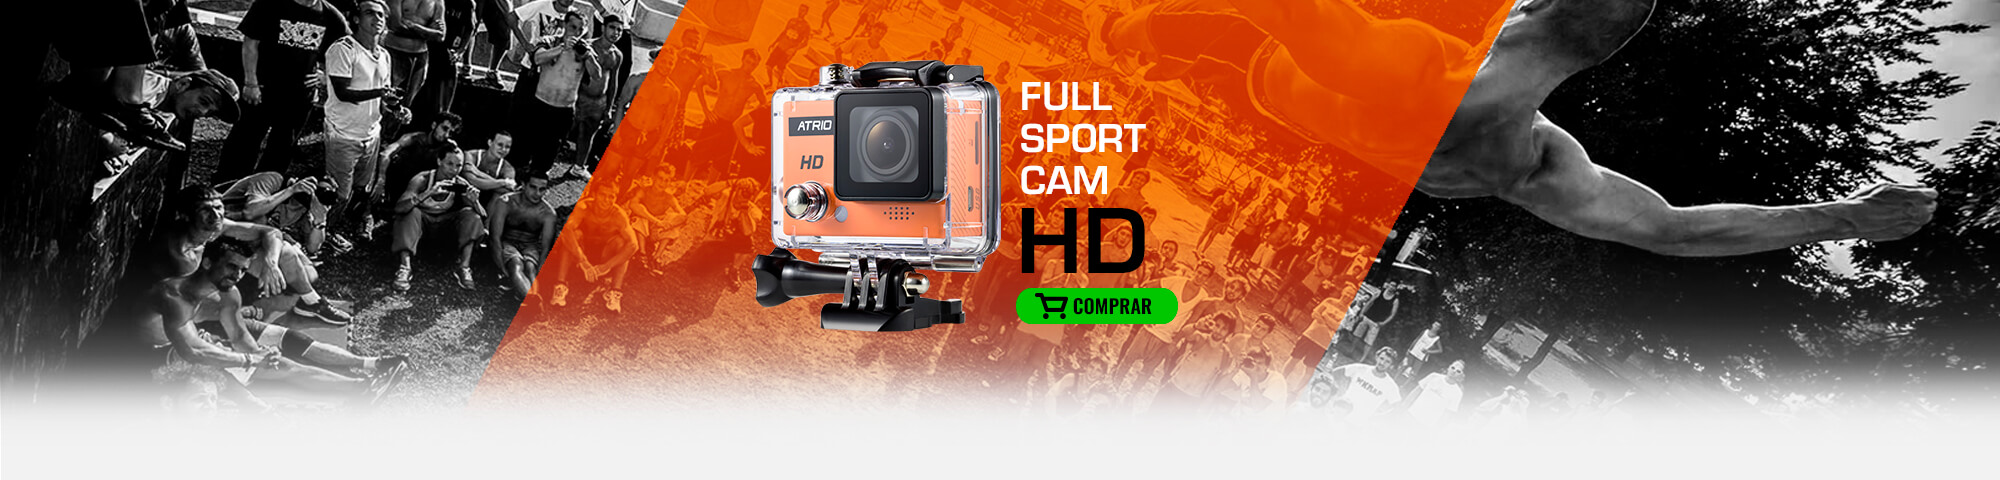 Camera Full Sport HD